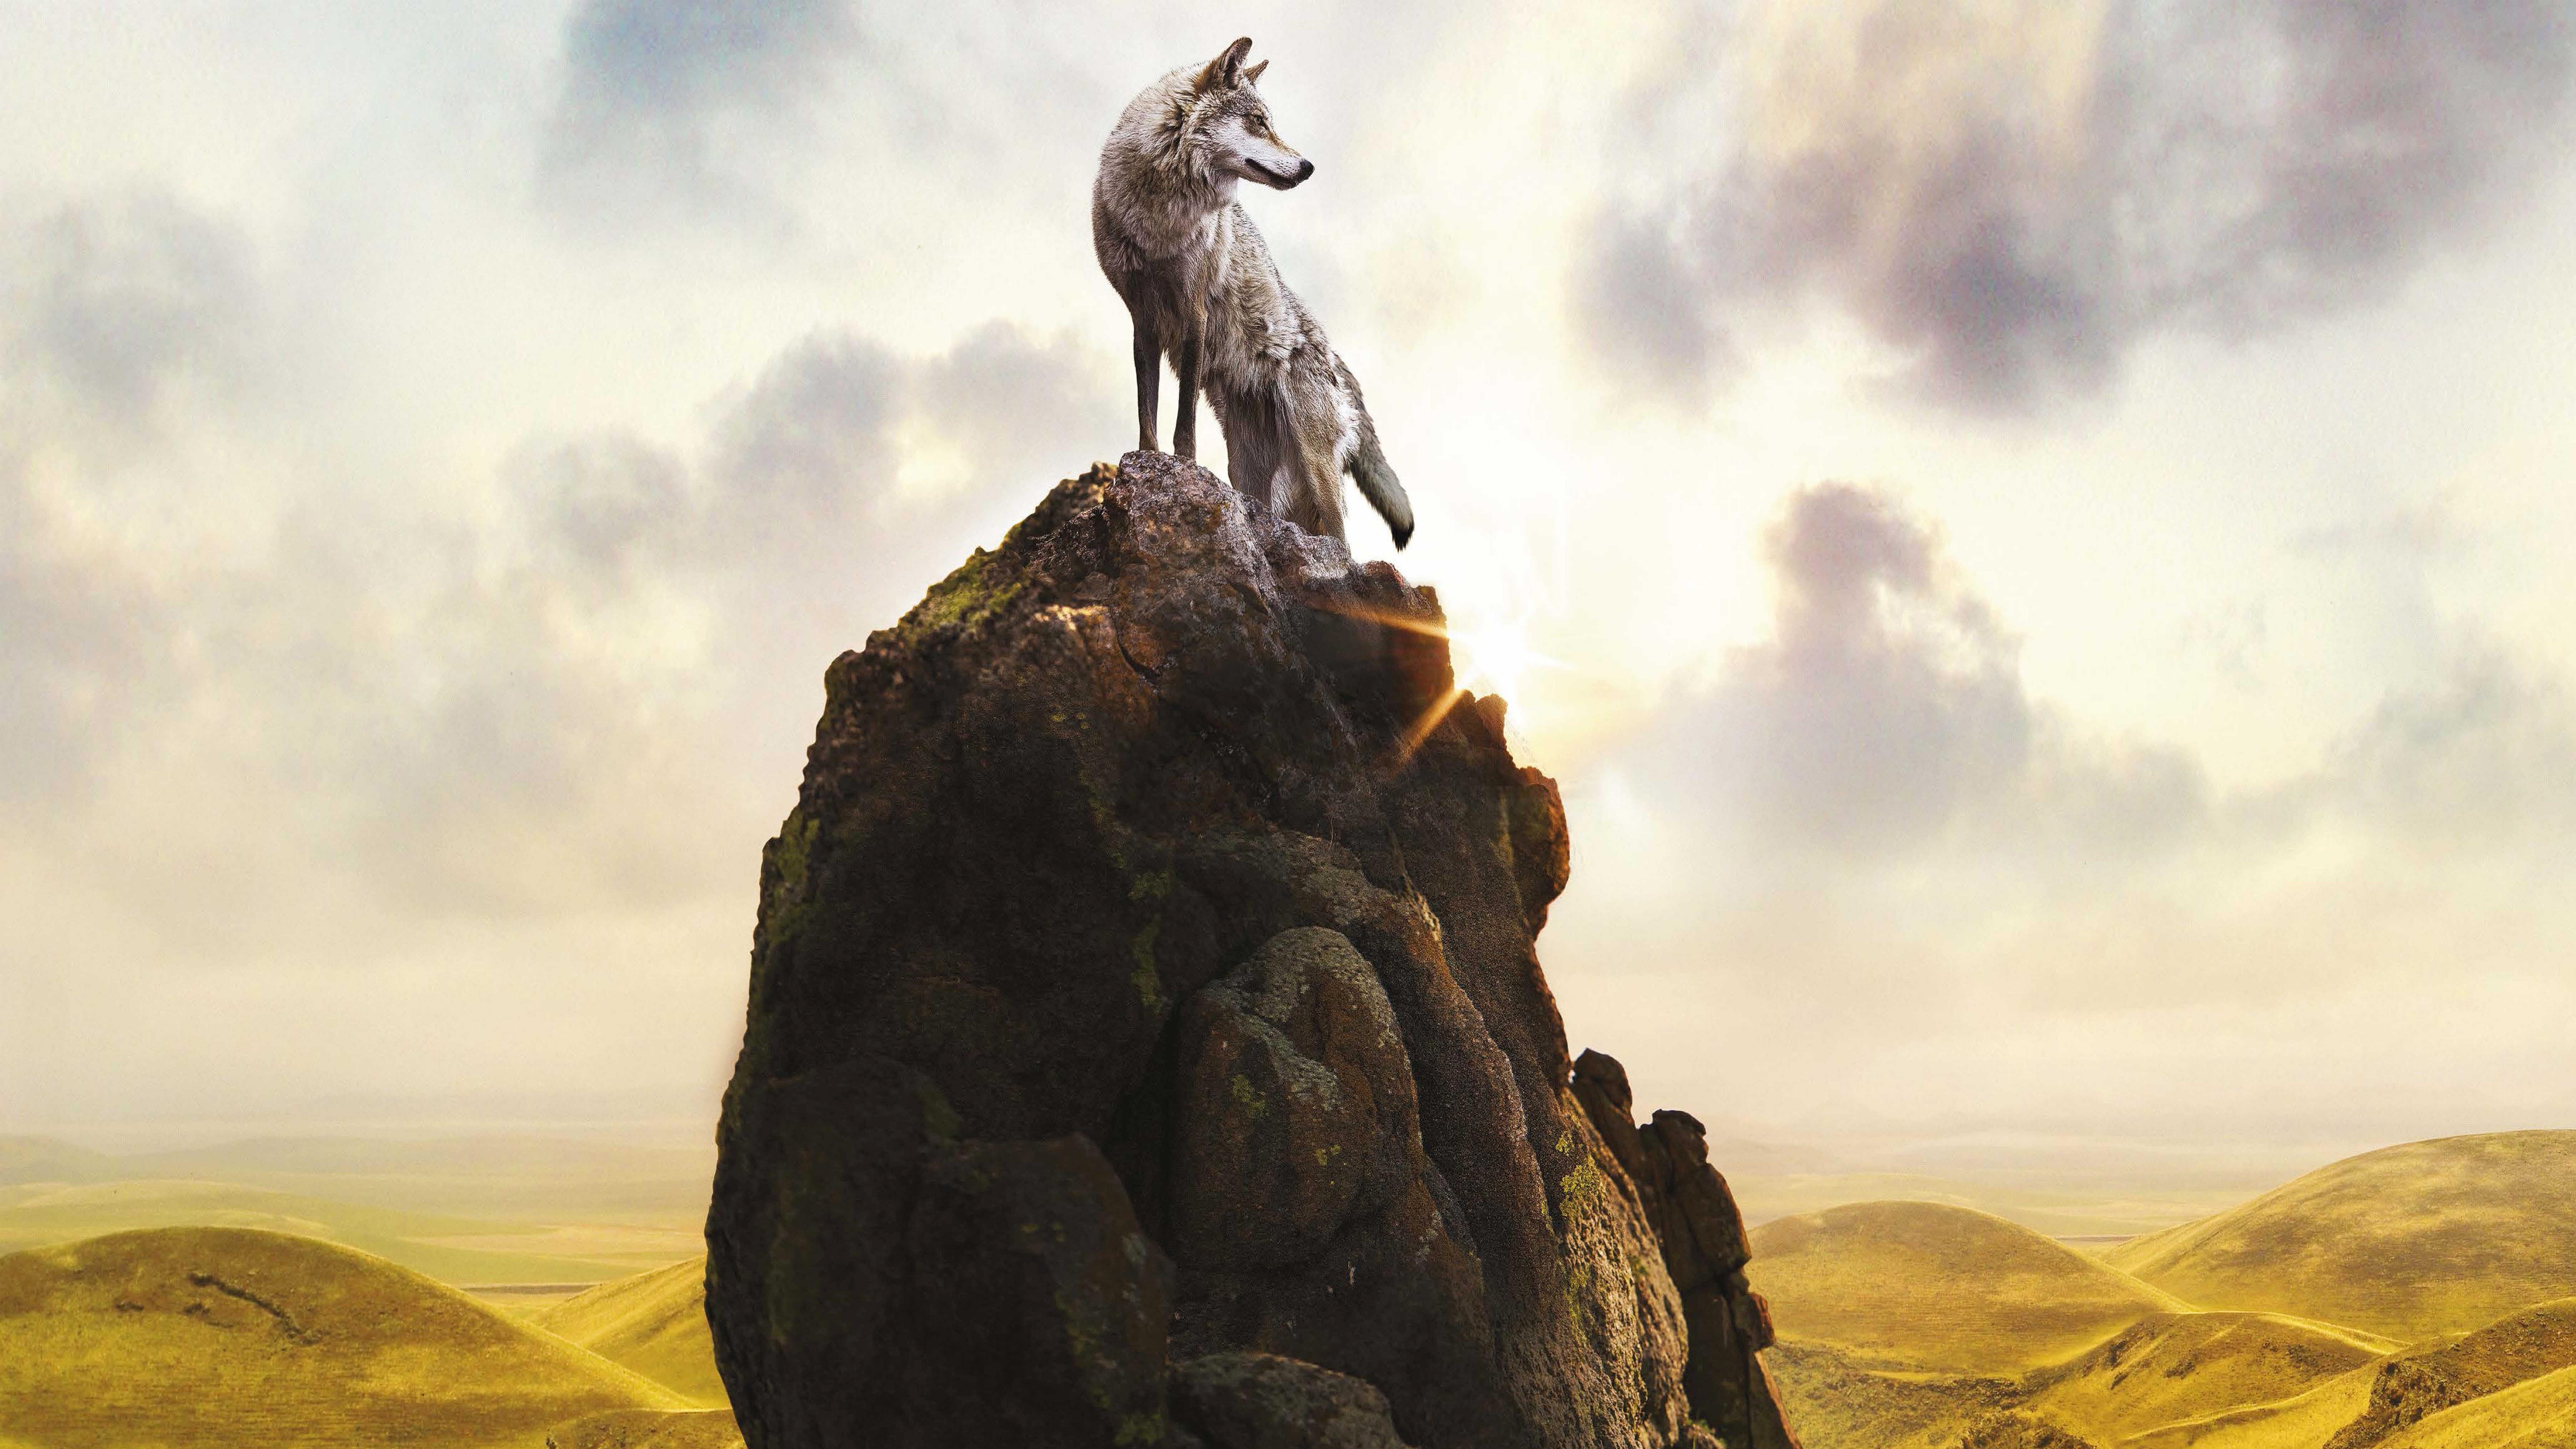 Wolf wallpapers photos and desktop backgrounds up to 8k - 8k desktop backgrounds ...